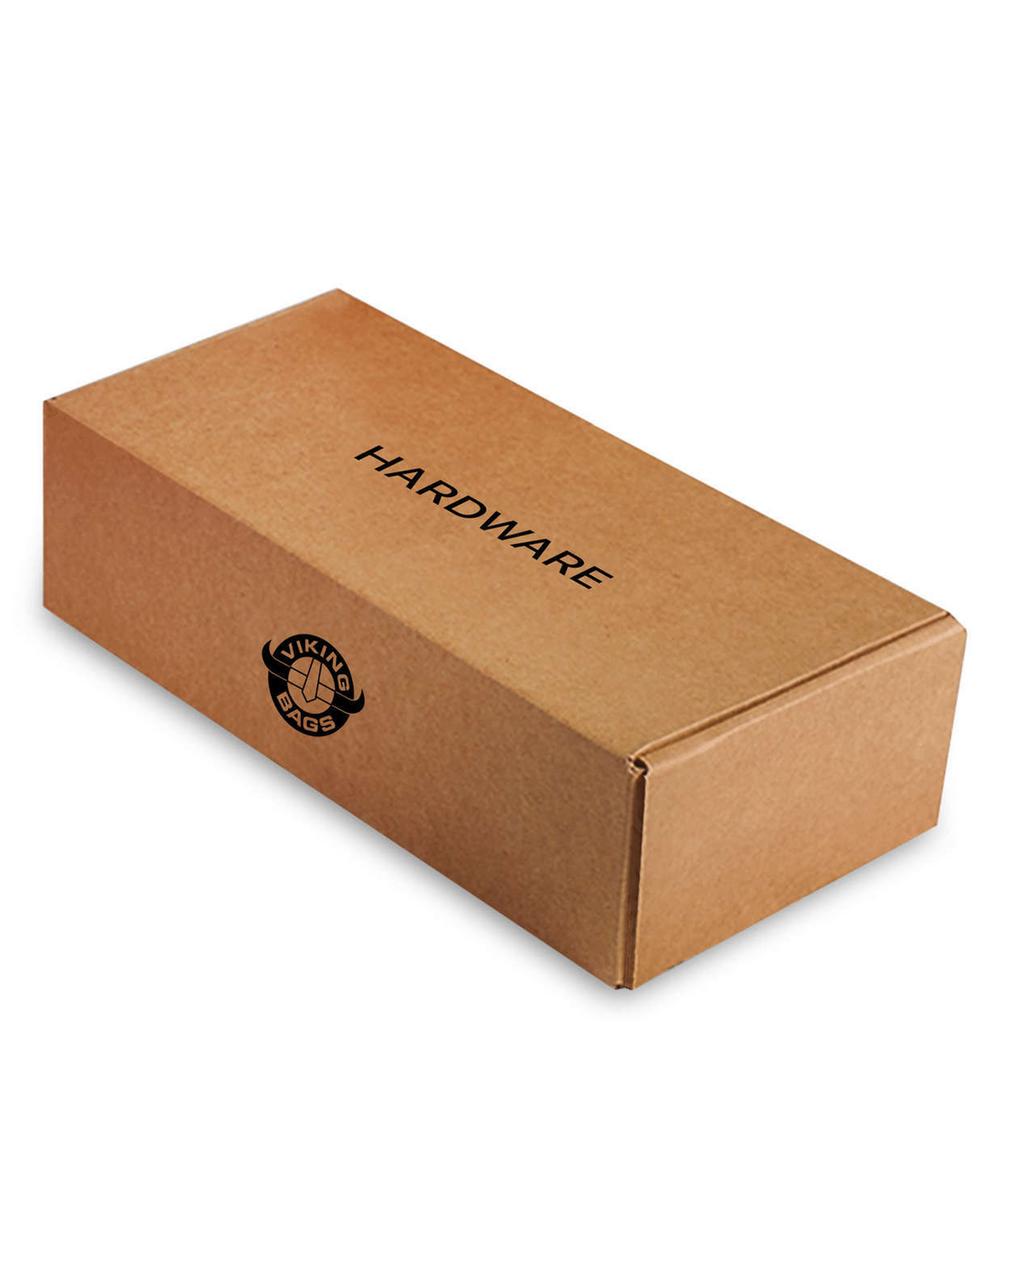 Honda Rebel 500 Single Strap Shock Cutout Slanted Large Motorcycle Saddlebags Hardware Box